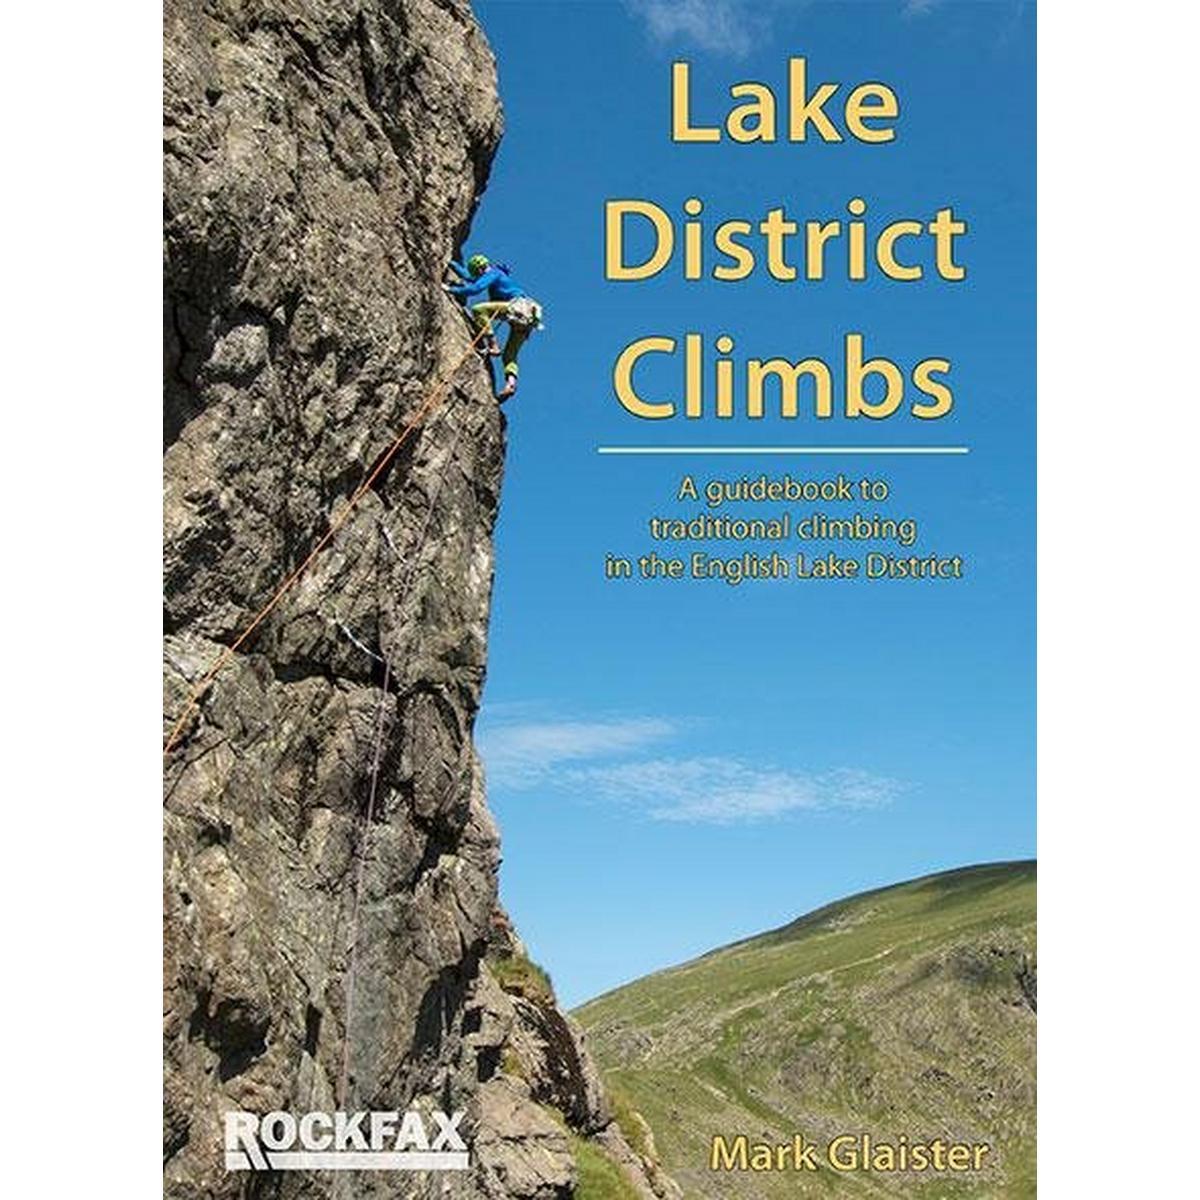 Rockfax Climbing Guide Book: Lake District Climbs